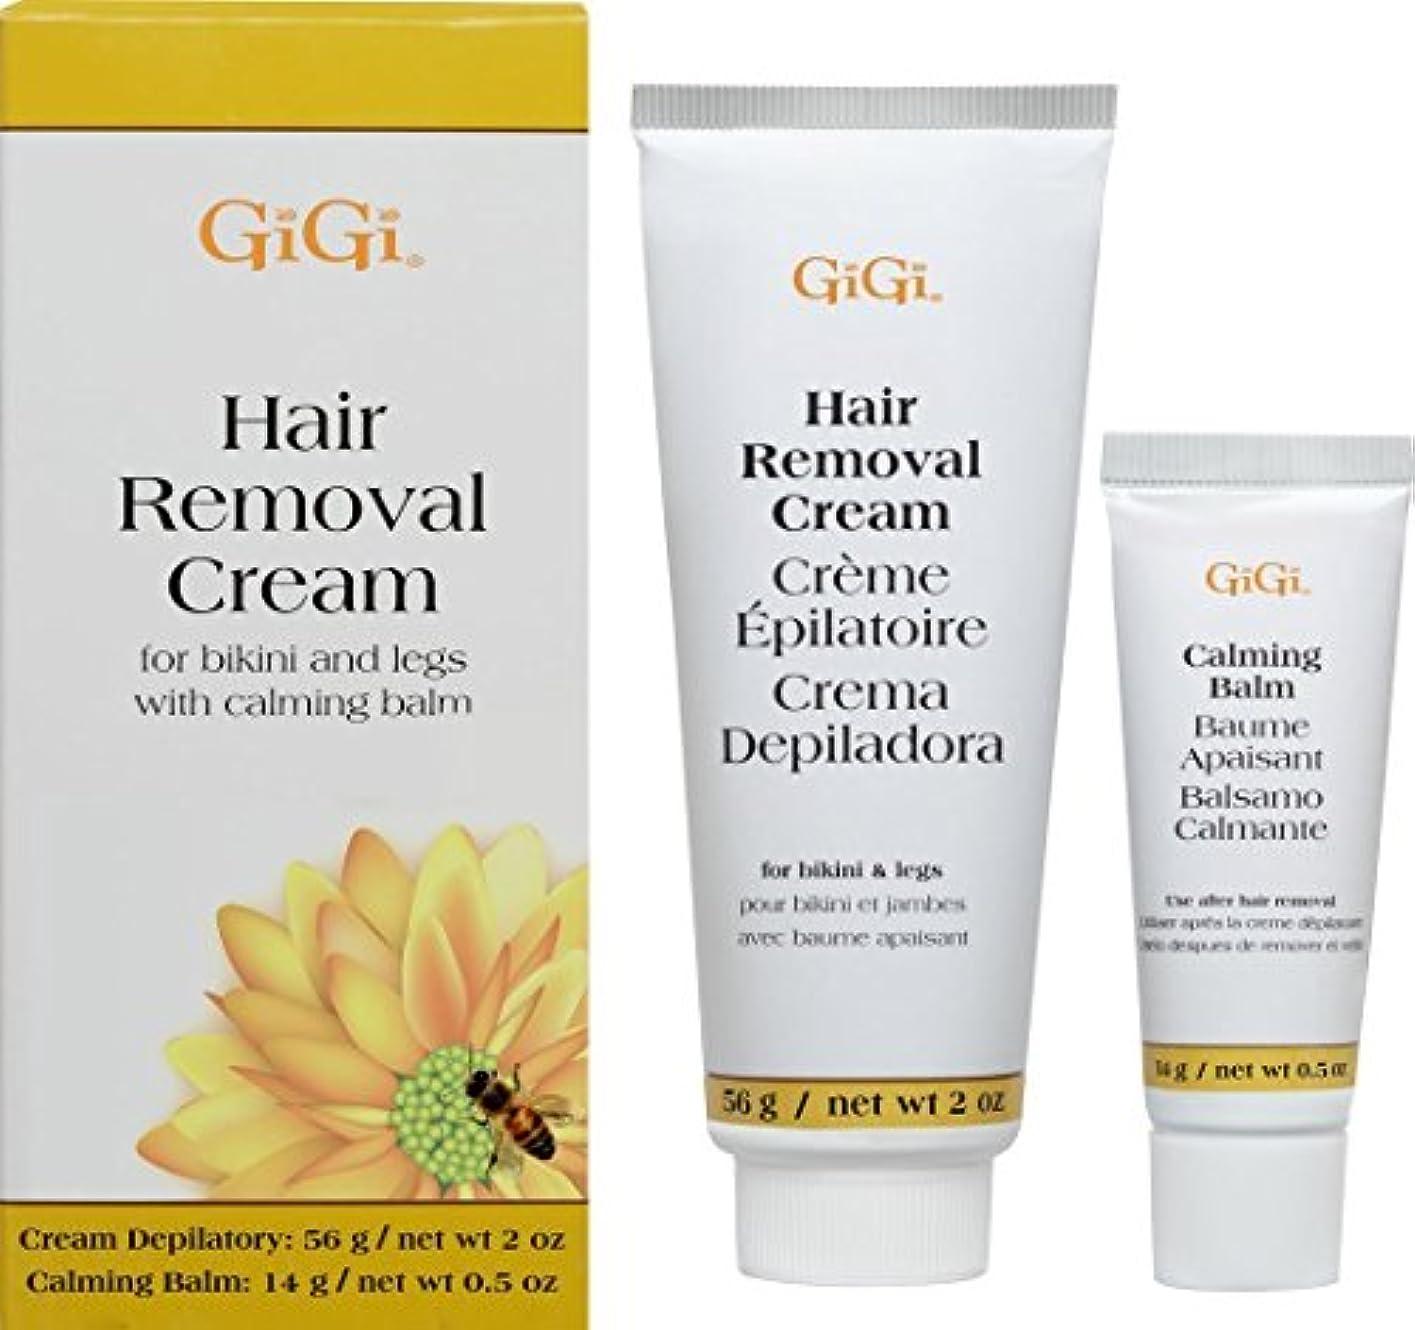 行政上昇離婚(1) - Gigi Hair Removal Cream W/Balm For Bikini & Legs